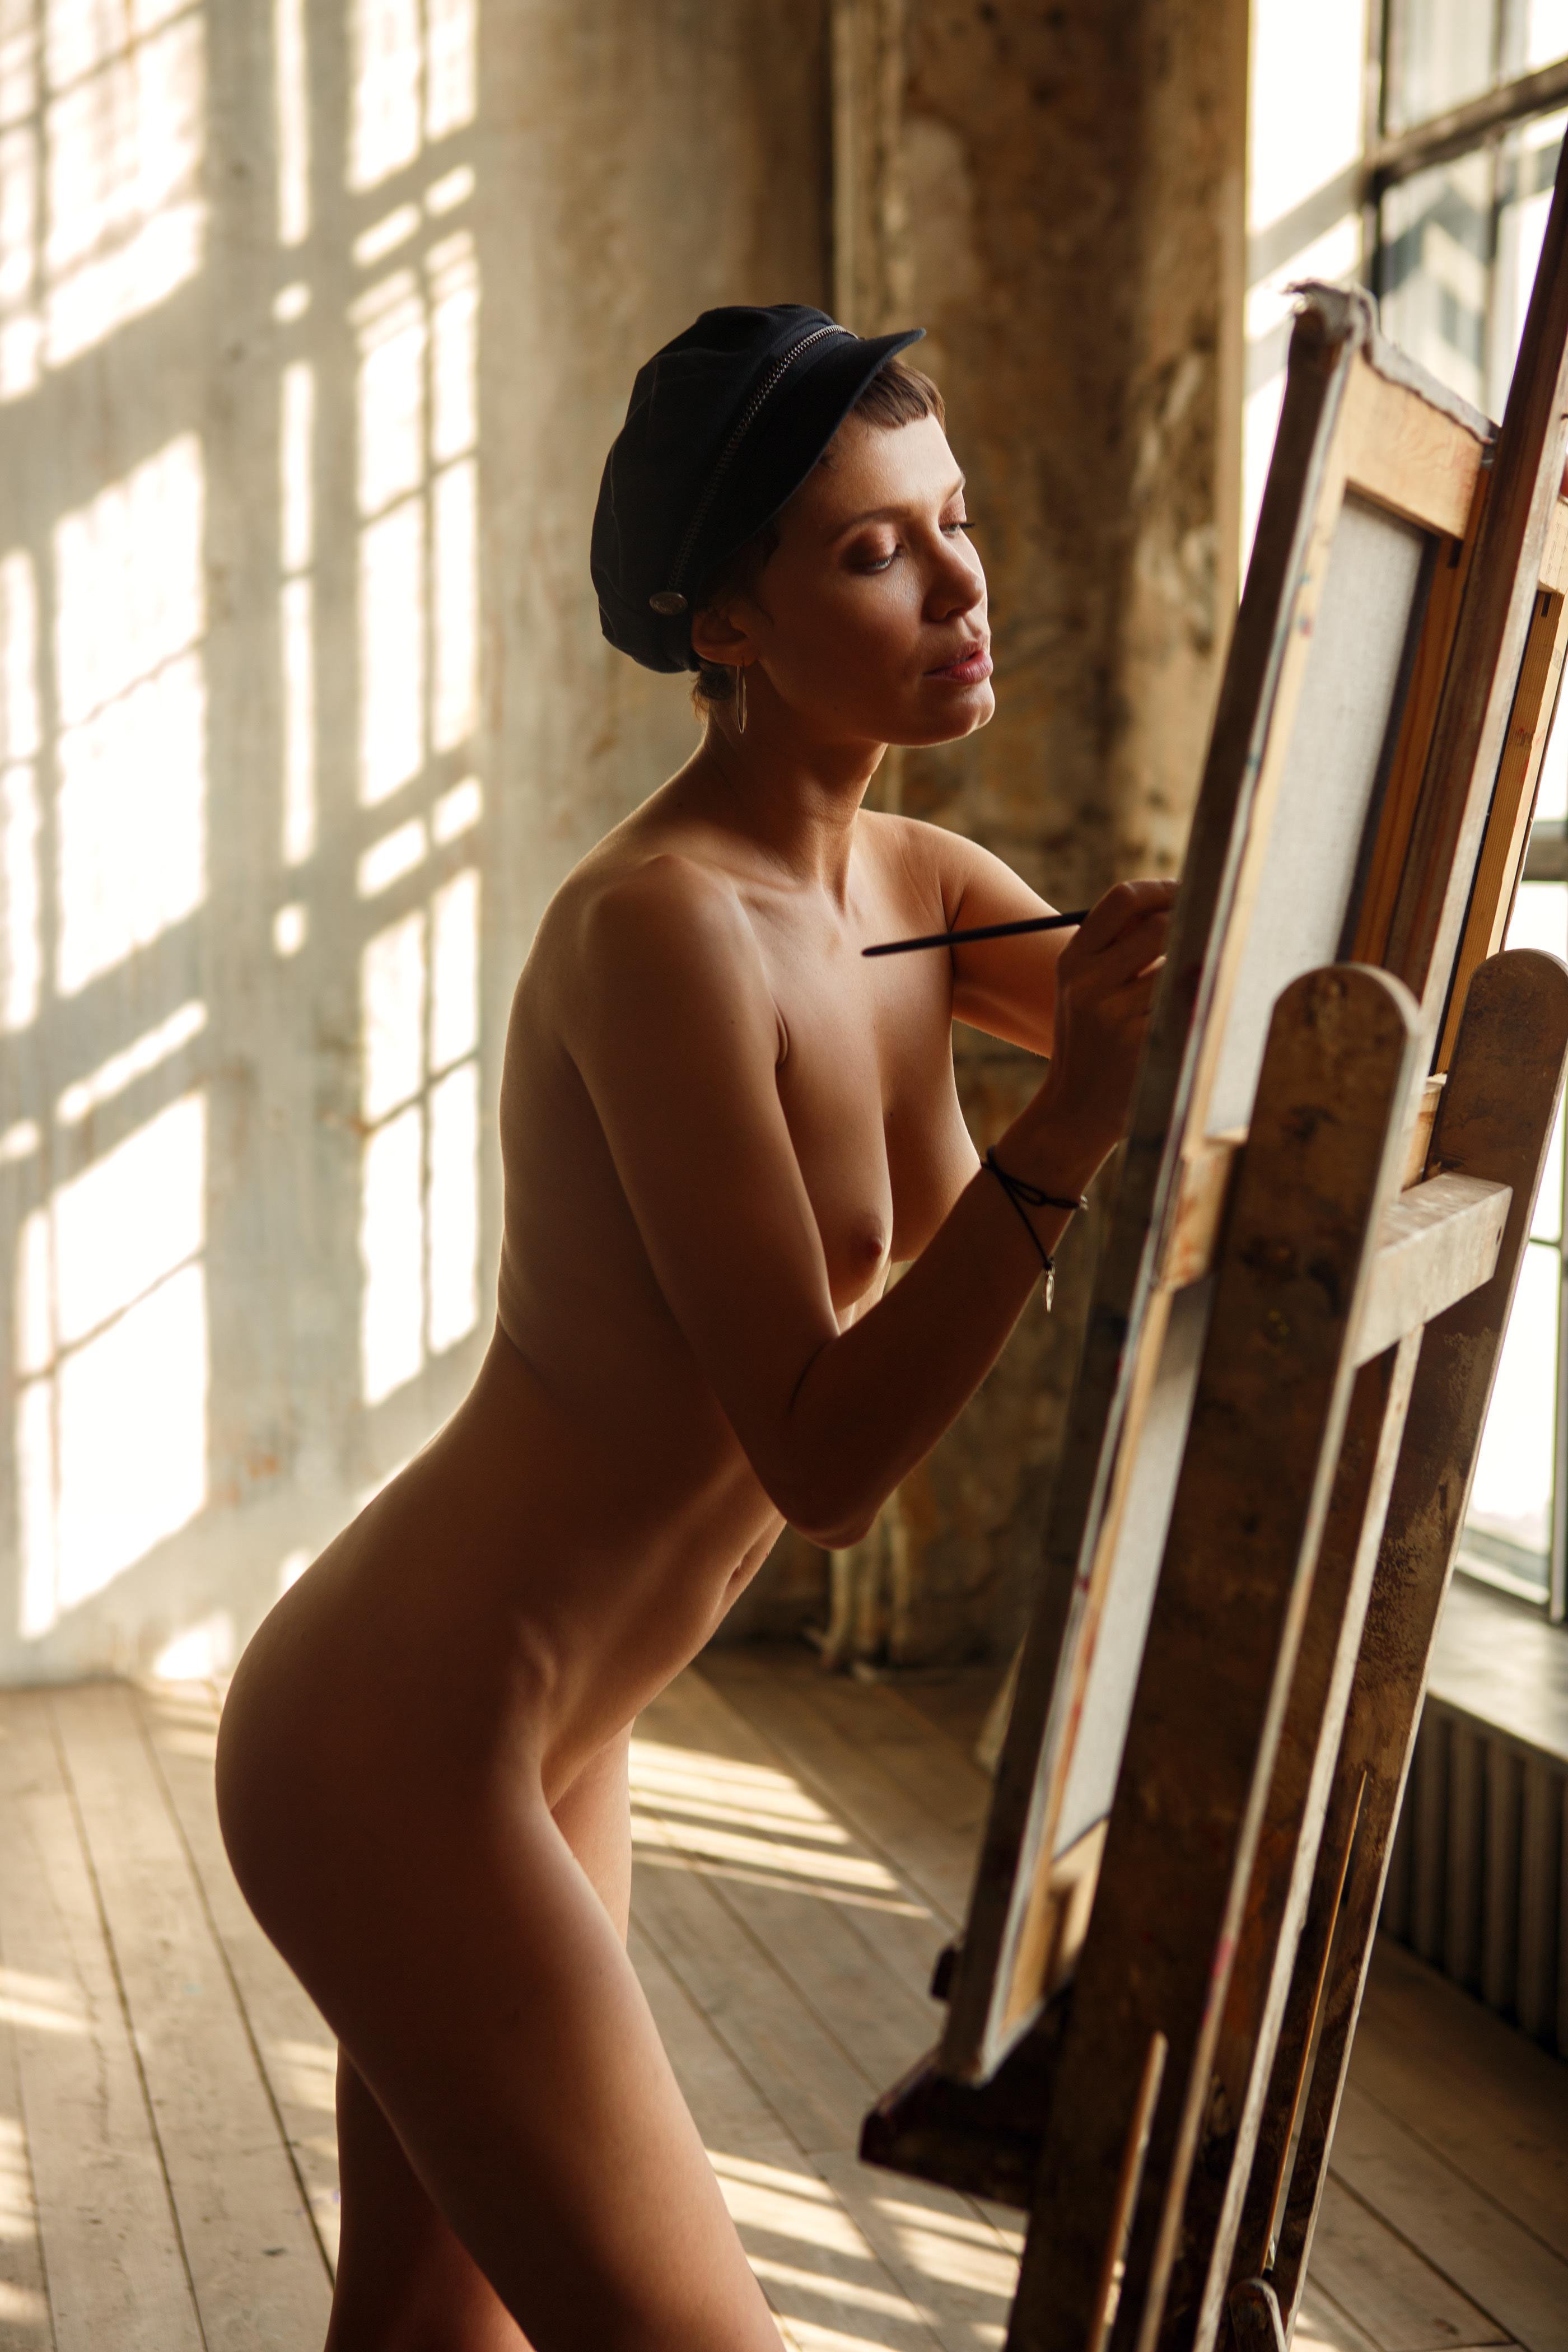 Модель Оксана Чуча / Фотограф Hannes Walendy